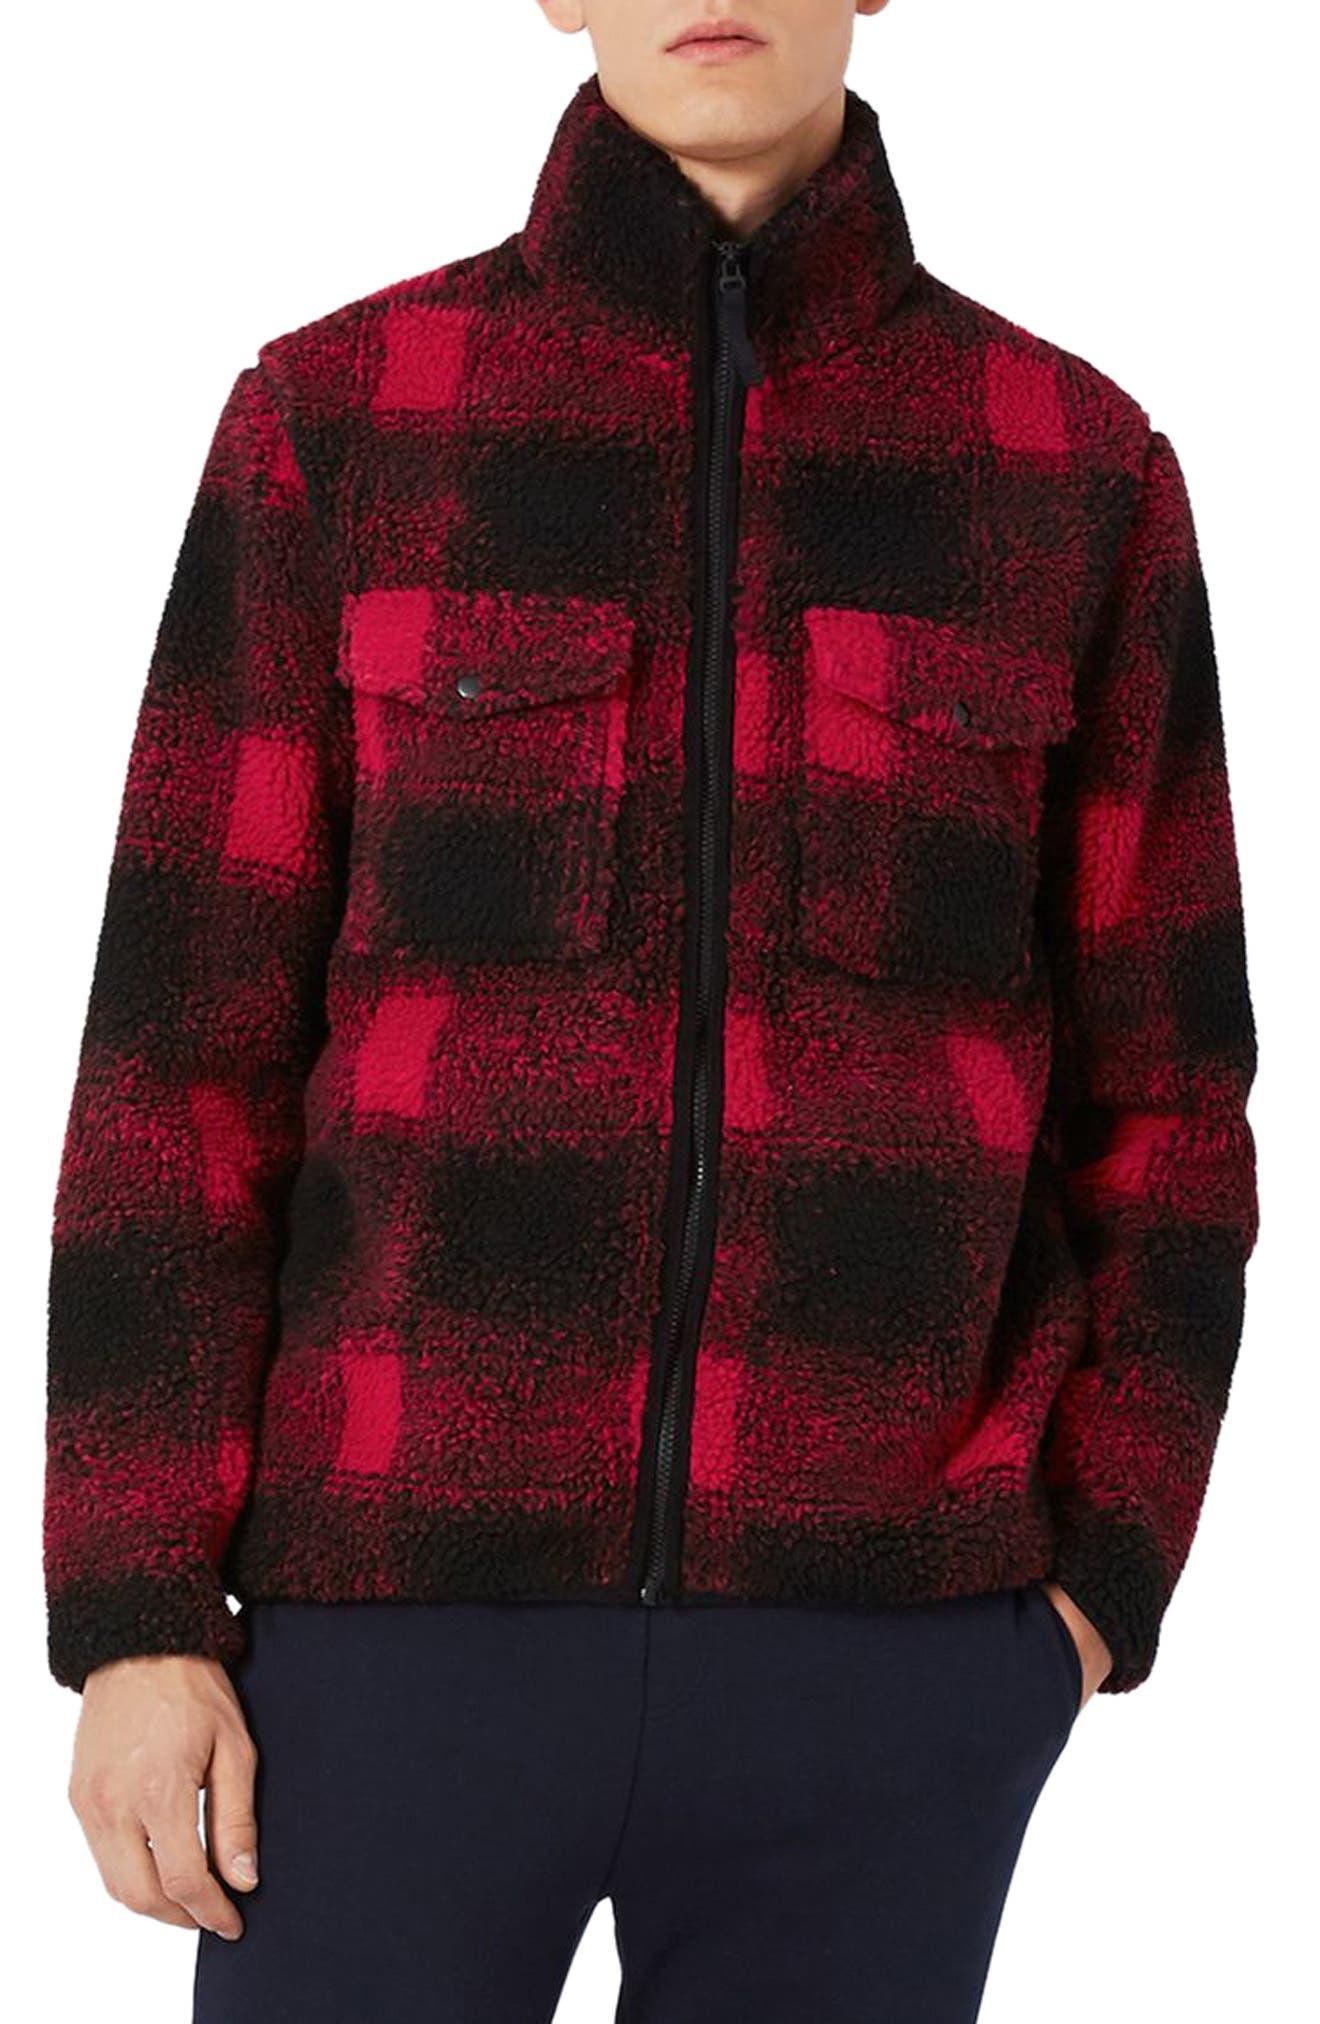 Buffalo Check Borg Jacket,                             Main thumbnail 1, color,                             Red Multi